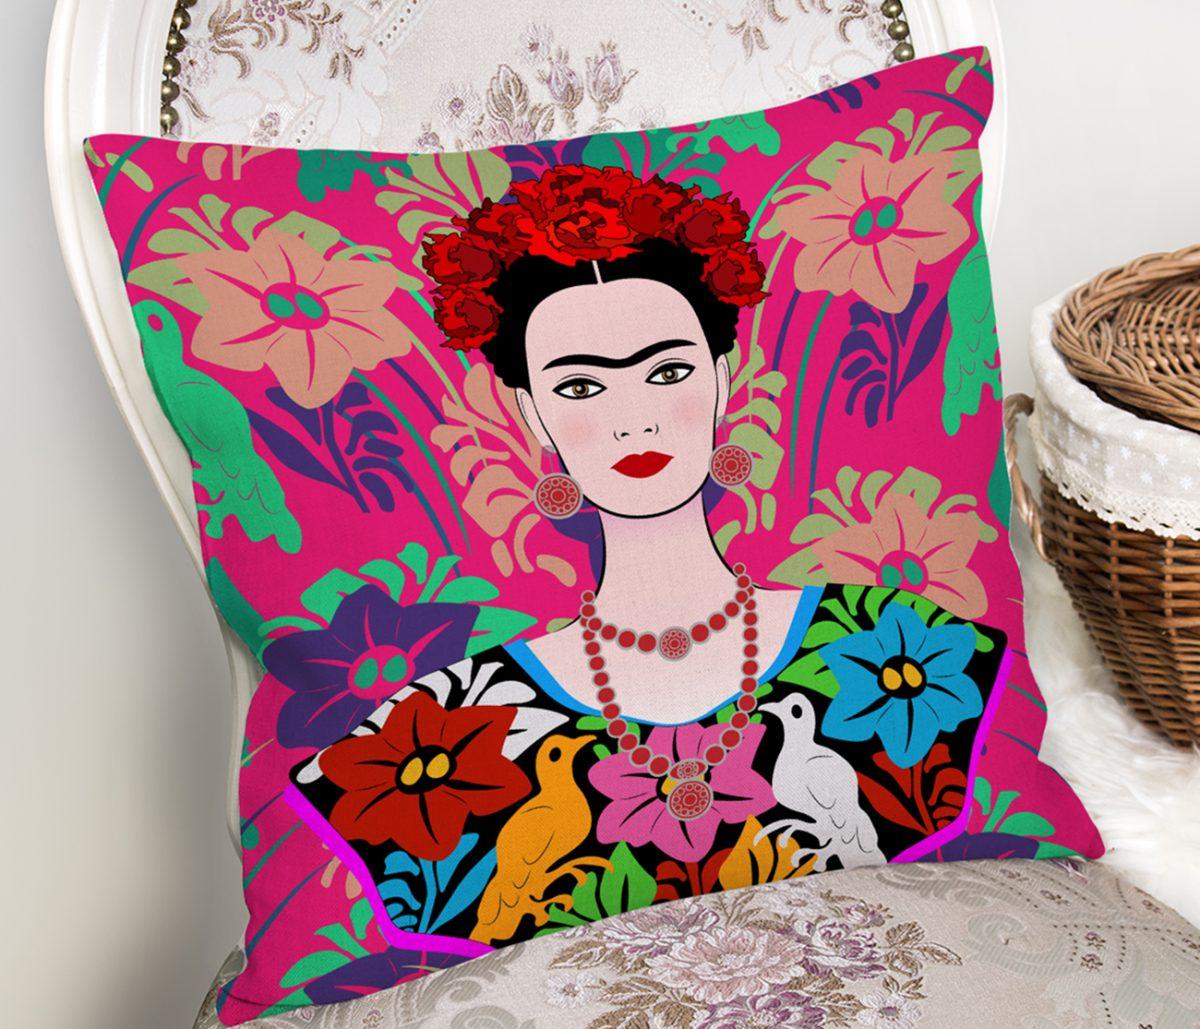 Fuşya Zeminde Frida Kahlo Motifli Özel Tasarım Kırlent Kılıfı Realhomes